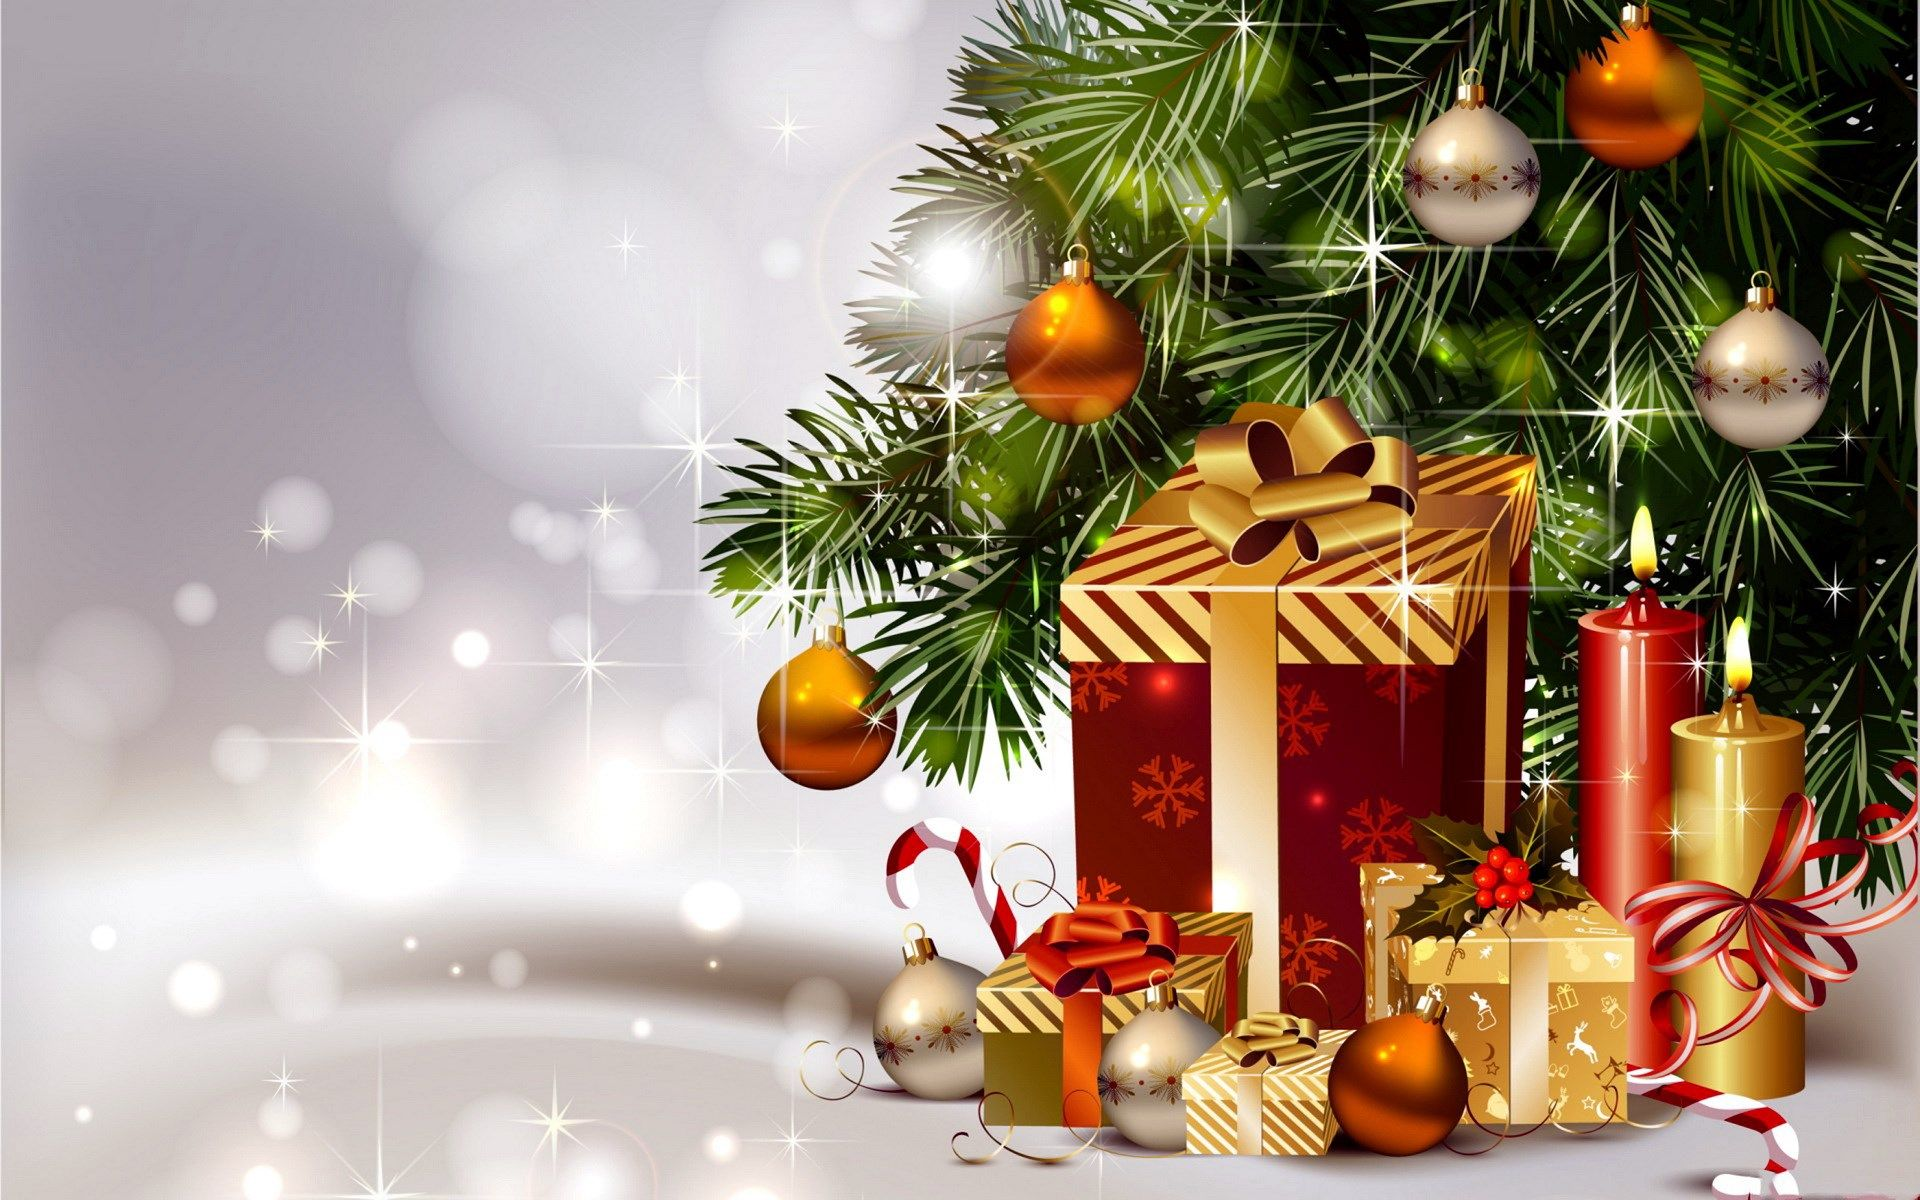 Christmas Whatsapp Status Merry Christmas Quotes Christmas Hd Images Funny Christmas Merry Christmas Wallpaper Christmas Wallpaper Hd Christmas Live Wallpaper